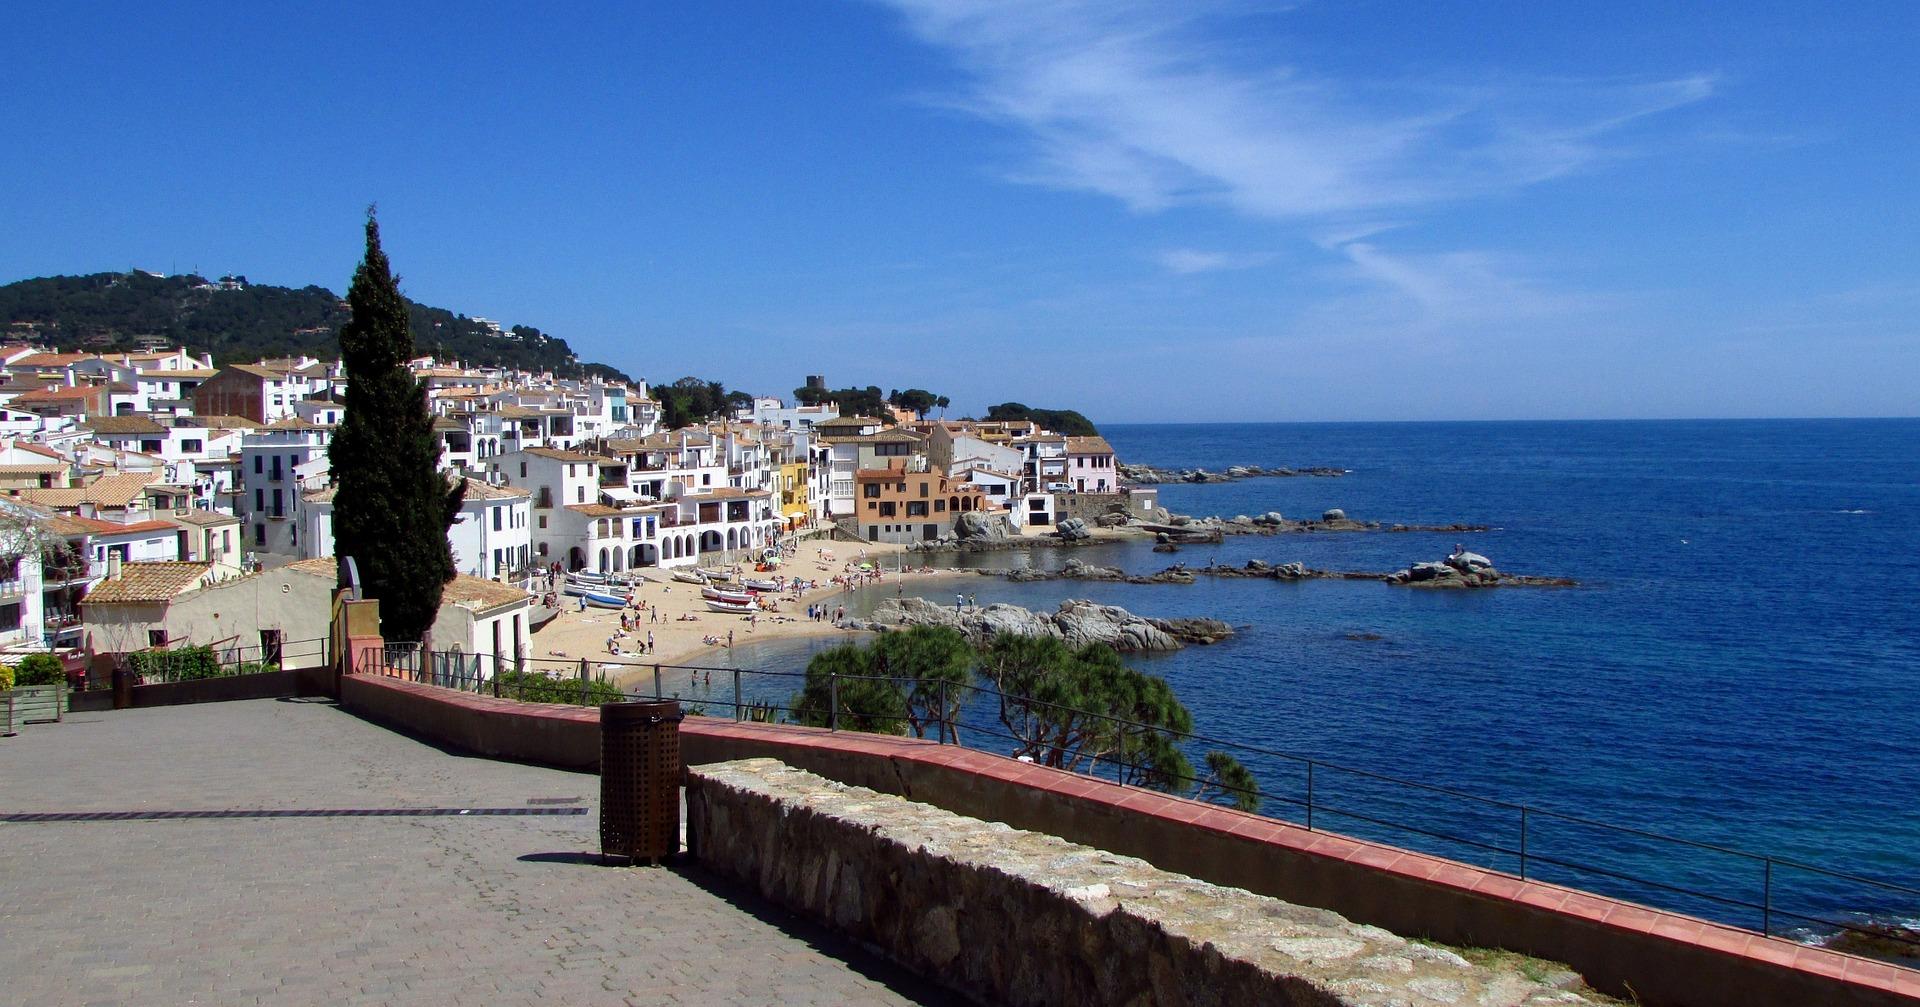 Der Ort Calella de Palafrugell an der Costa Brava